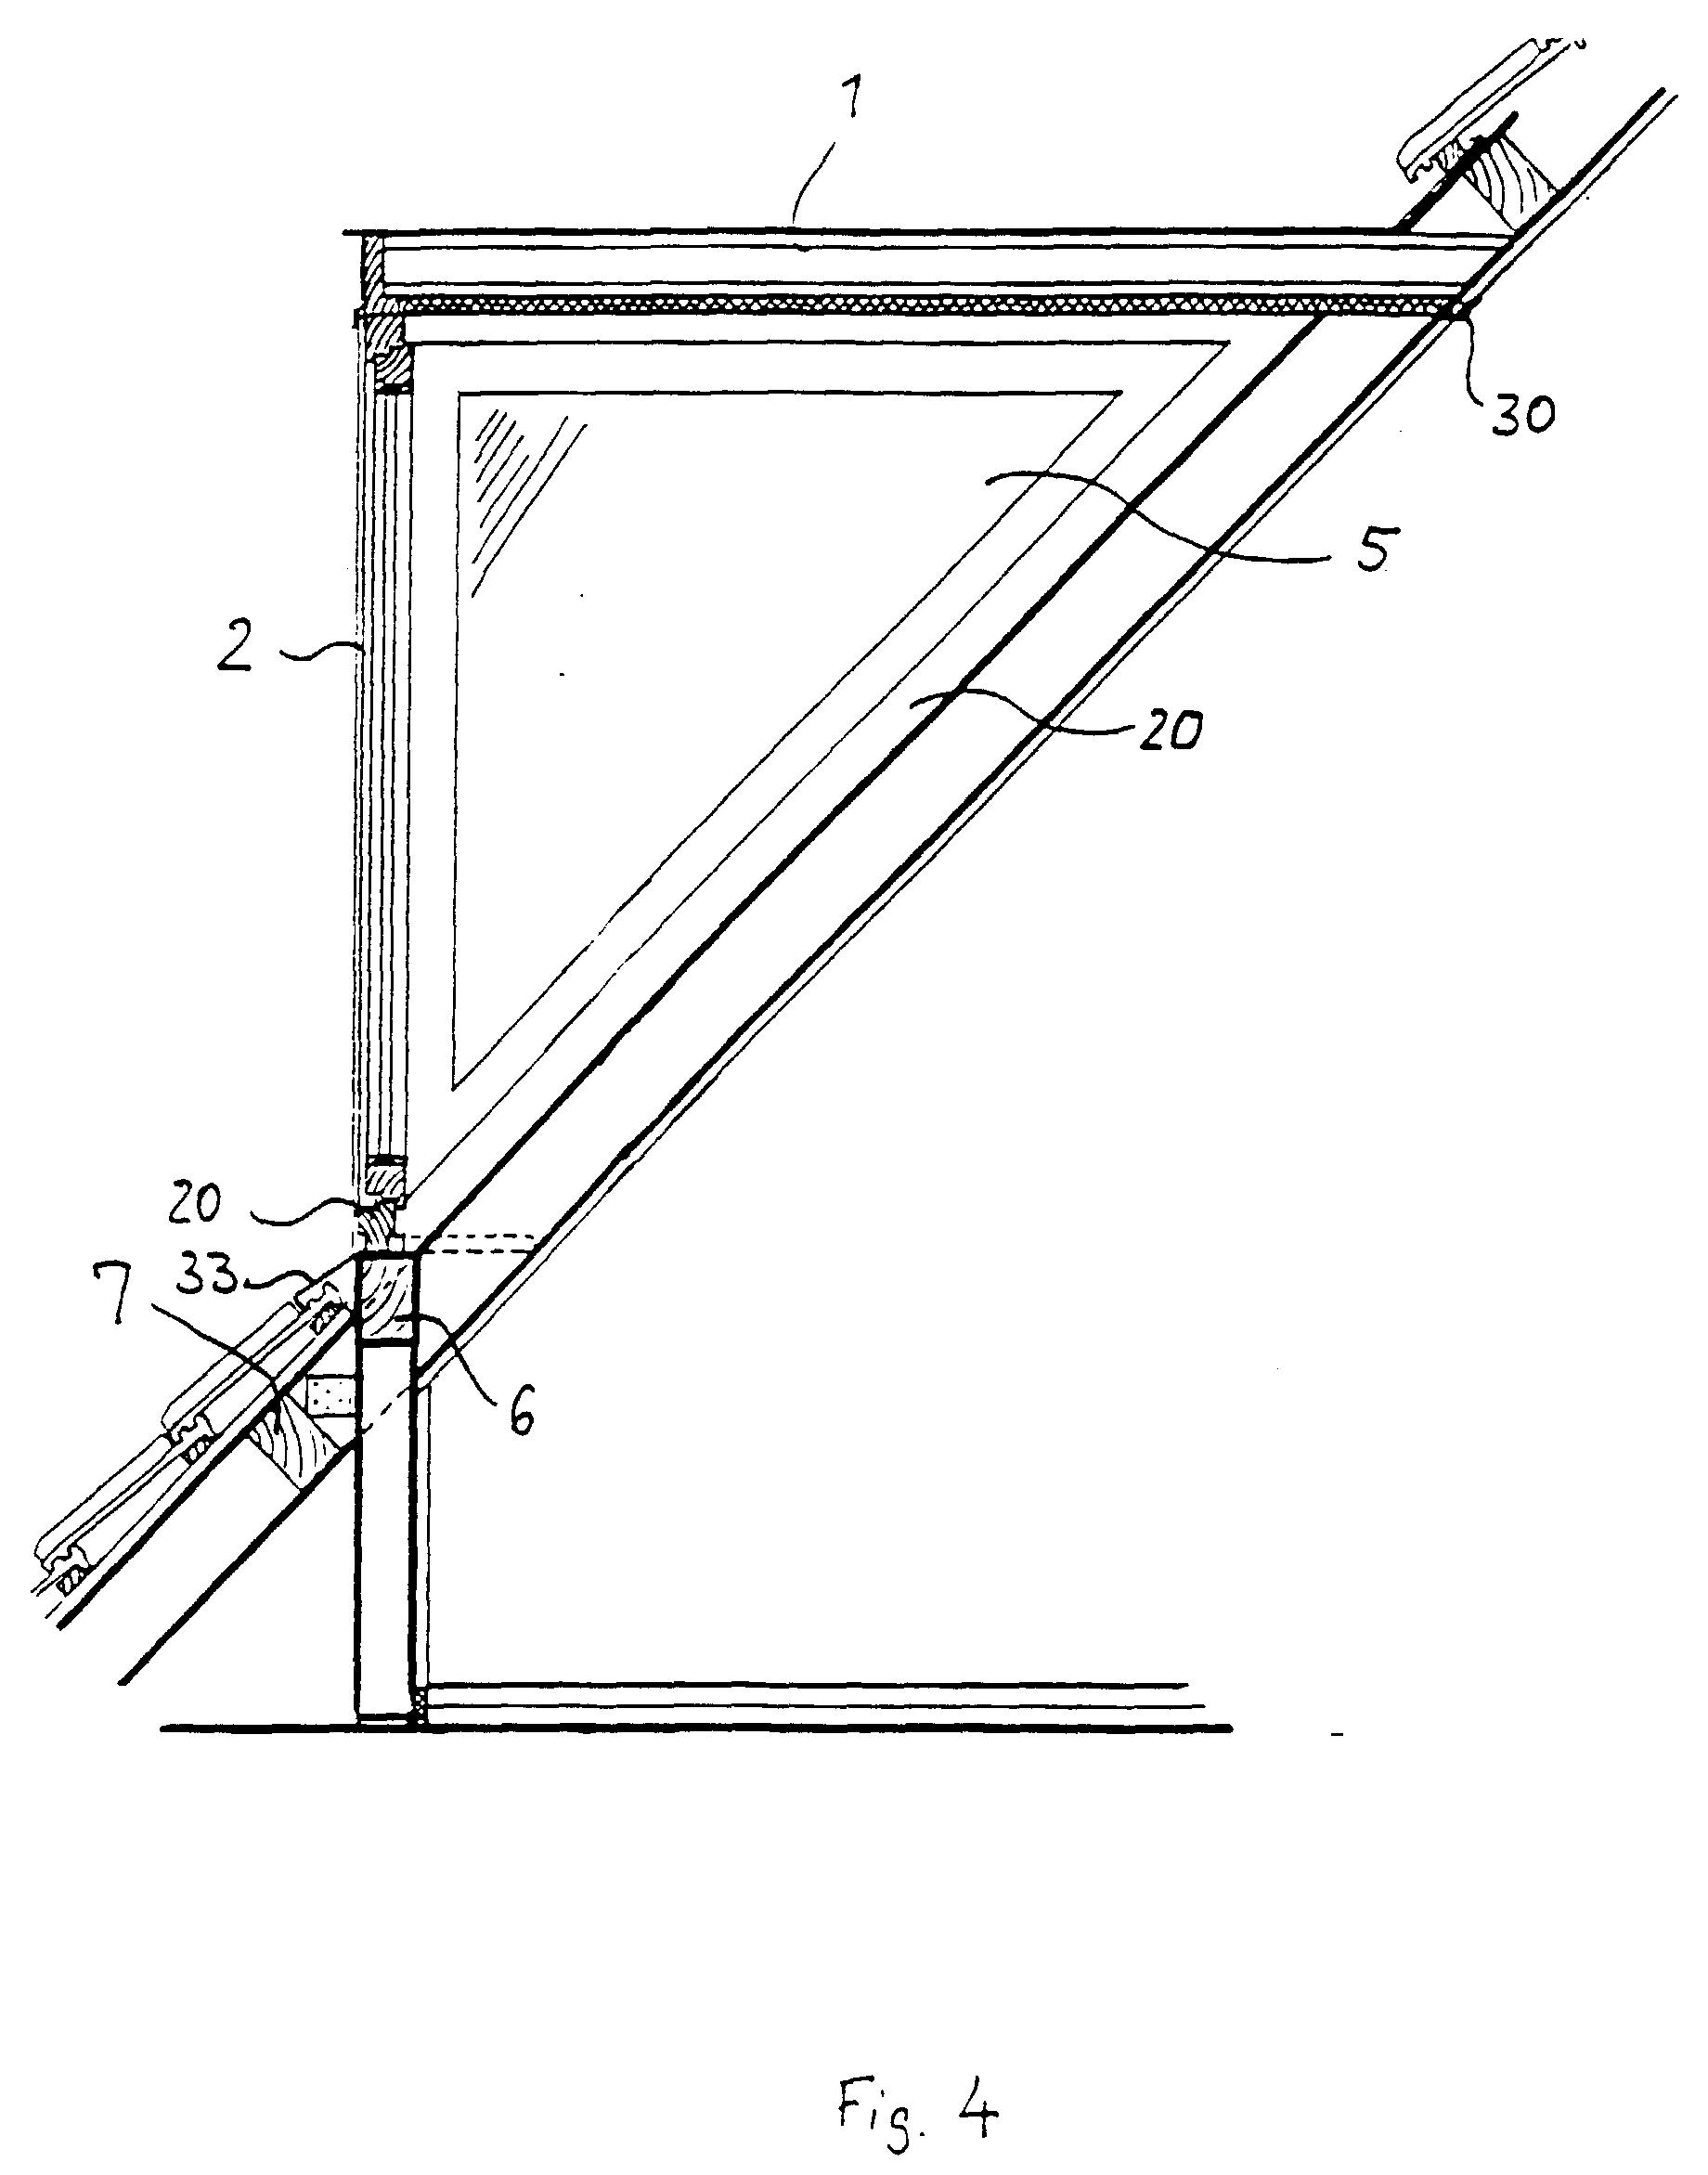 patente ep0750707b1 dachgaube google patentes. Black Bedroom Furniture Sets. Home Design Ideas